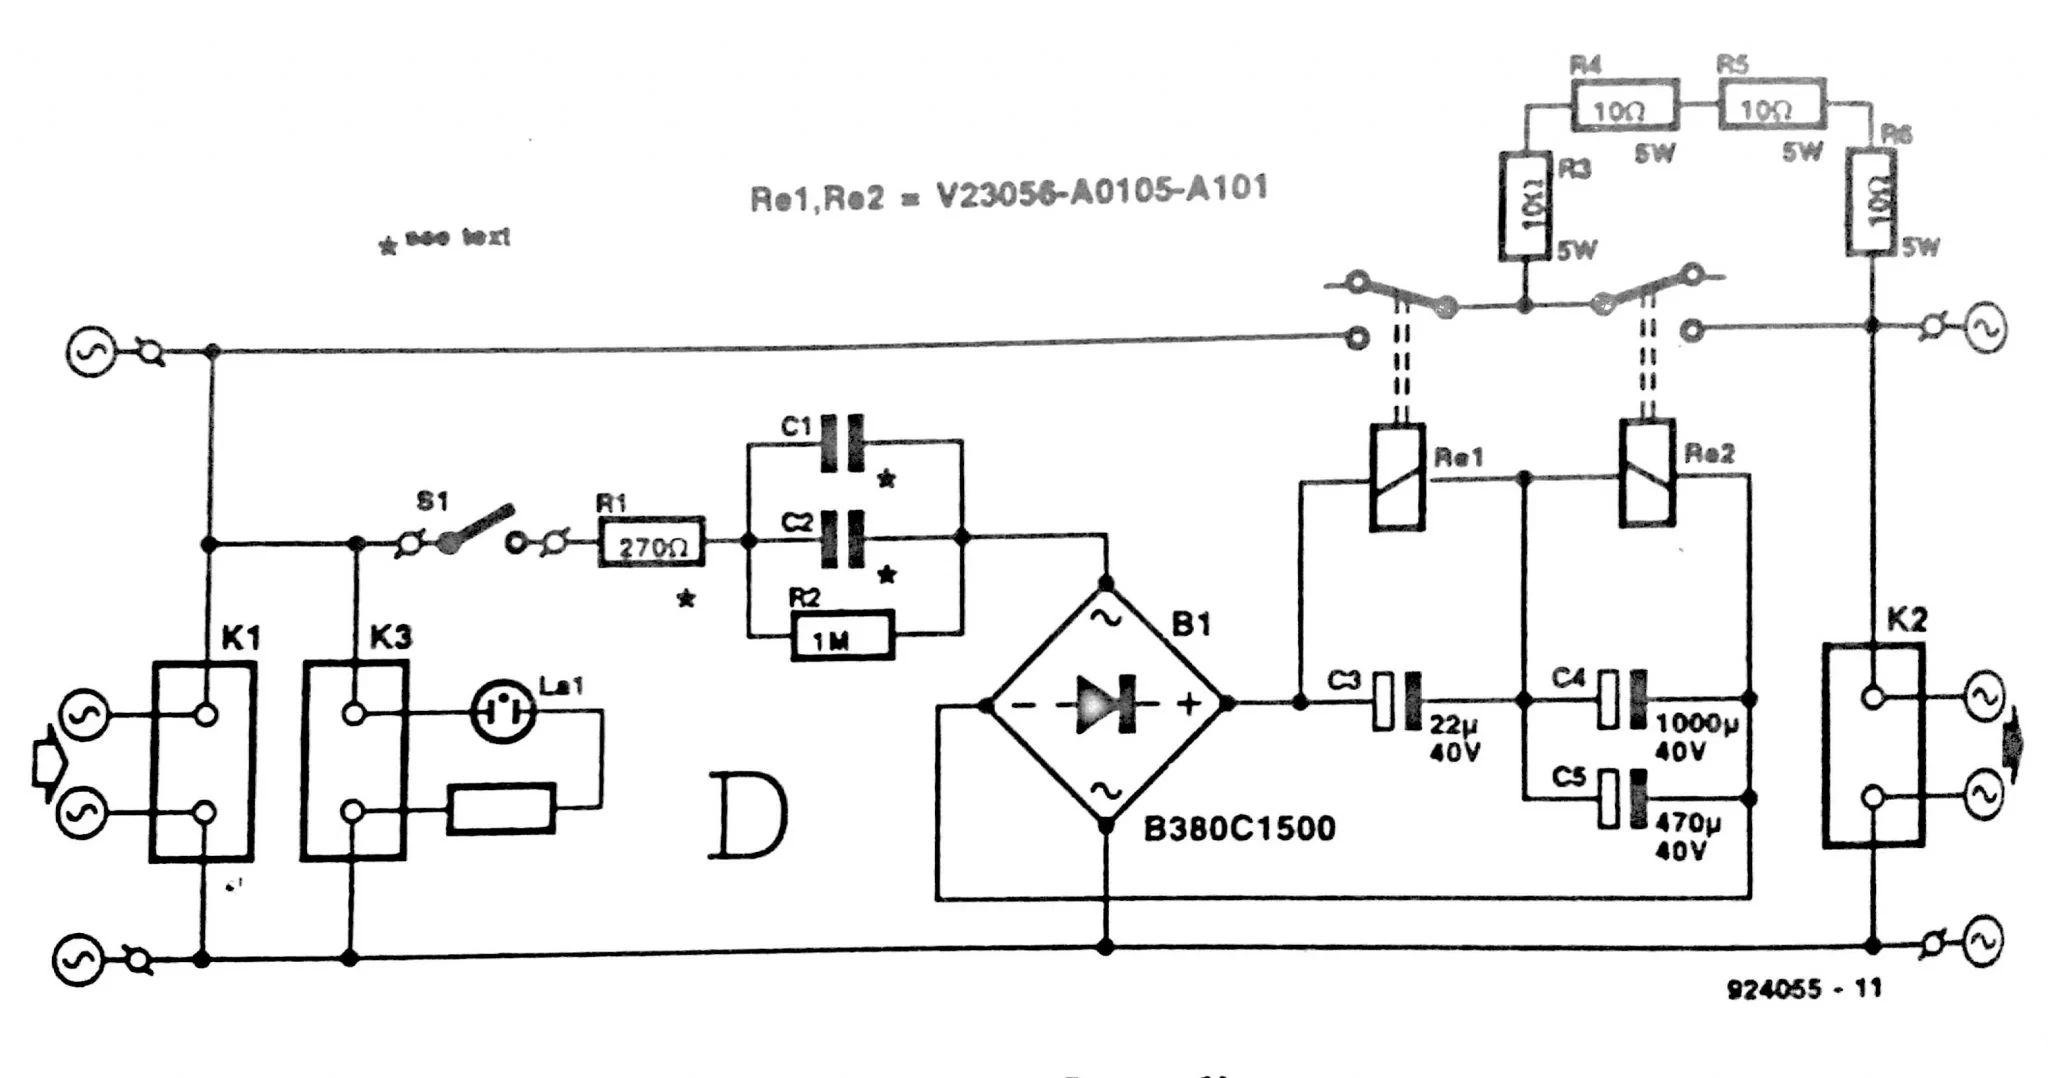 power off delay circuit